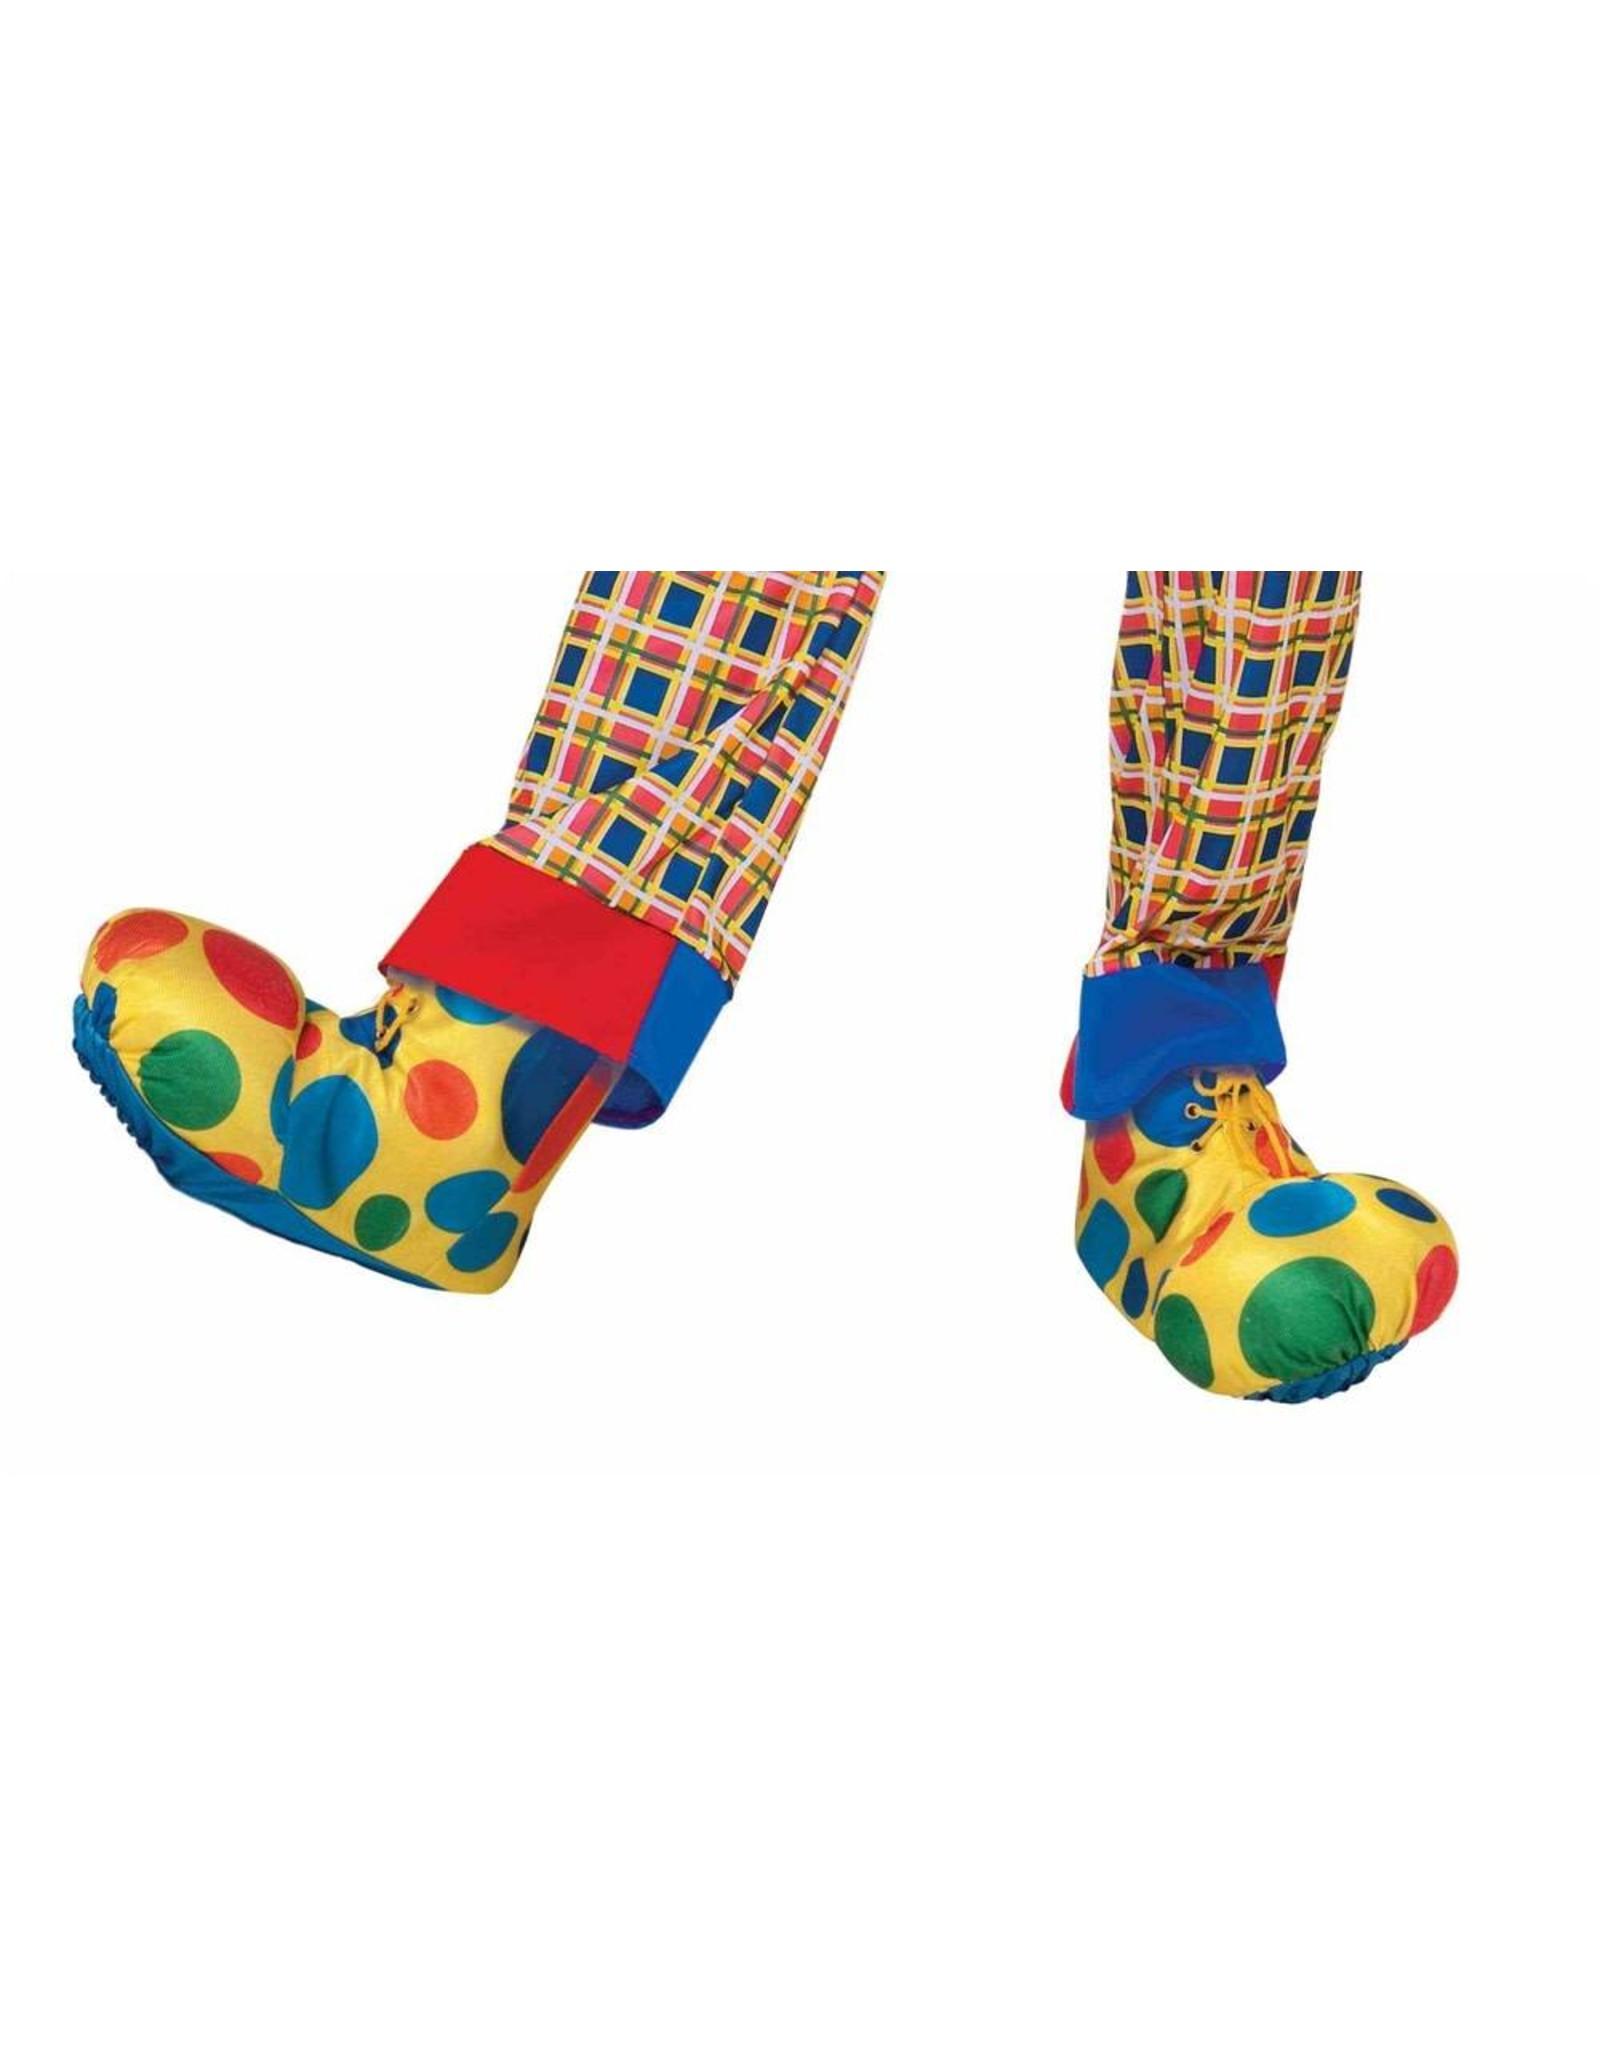 Forum Clown Shoe Covers